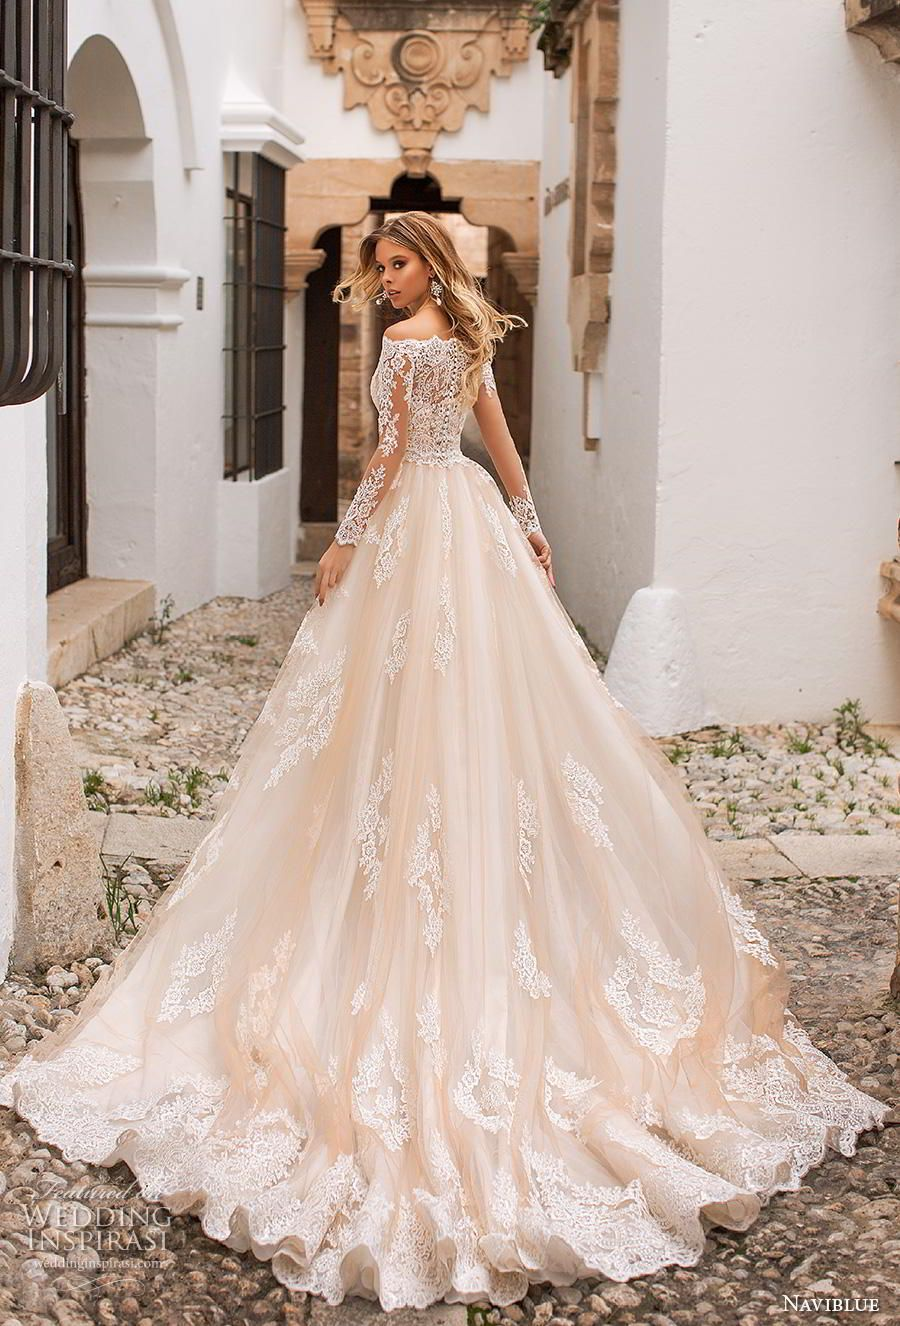 Naviblue 2019 Wedding Dresses Dolly Bridal Collection Wedding Inspirasi Lace Mermaid Wedding Dress Pregnant Wedding Dress A Line Wedding Dress [ jpg ]